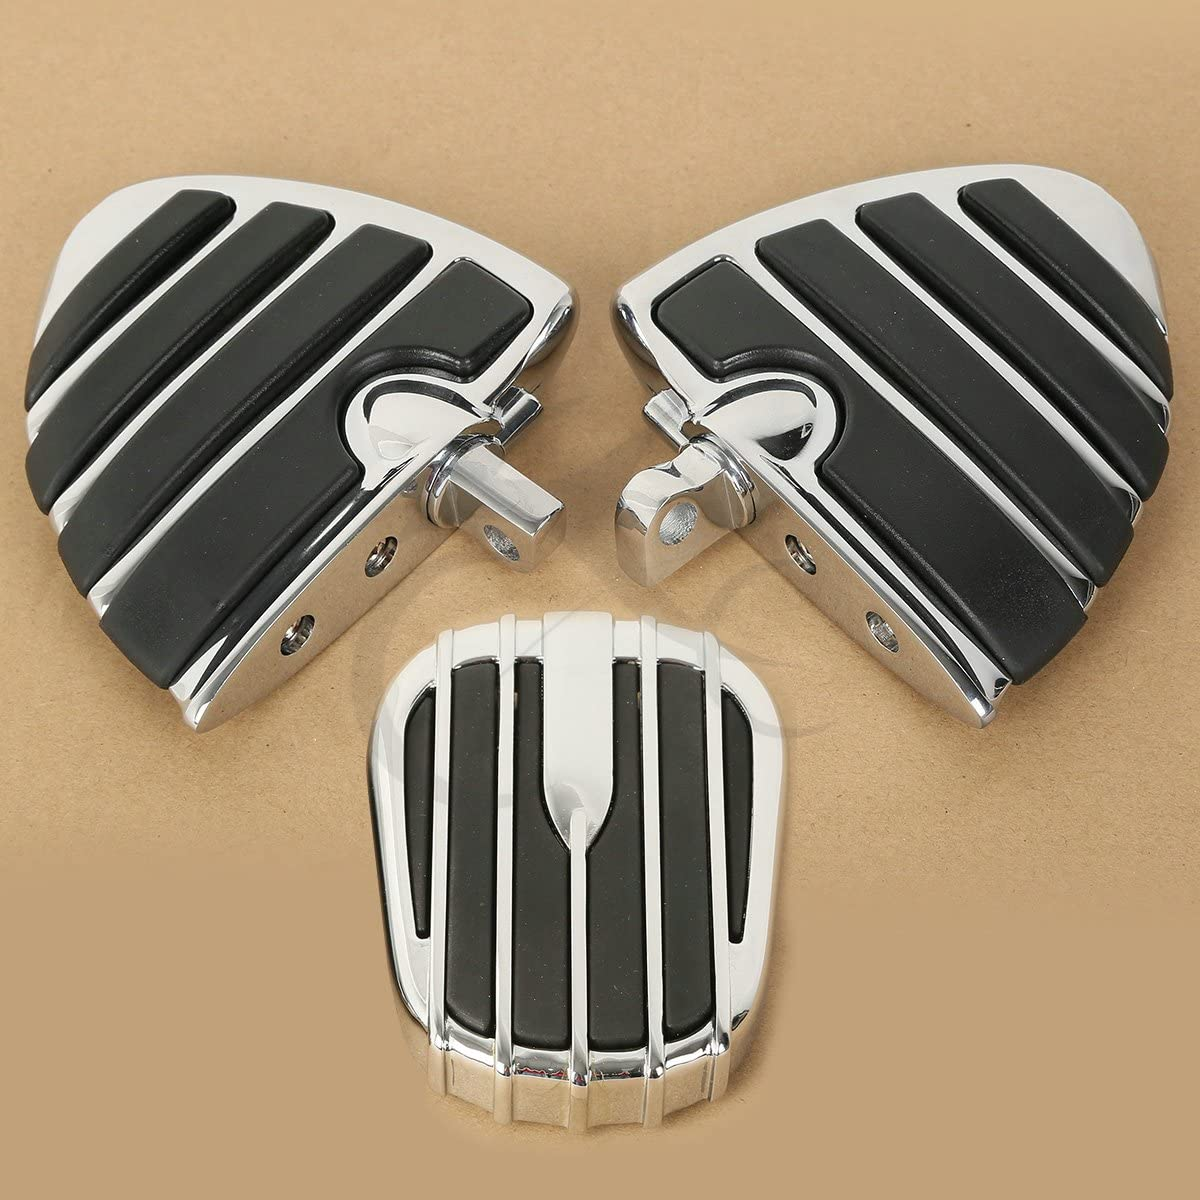 TengChang Motorrad Bremspedal Abdeckung Pad FootPeg Fu/ßst/ützen f/ür Harley Softail Ultra Limited Touring